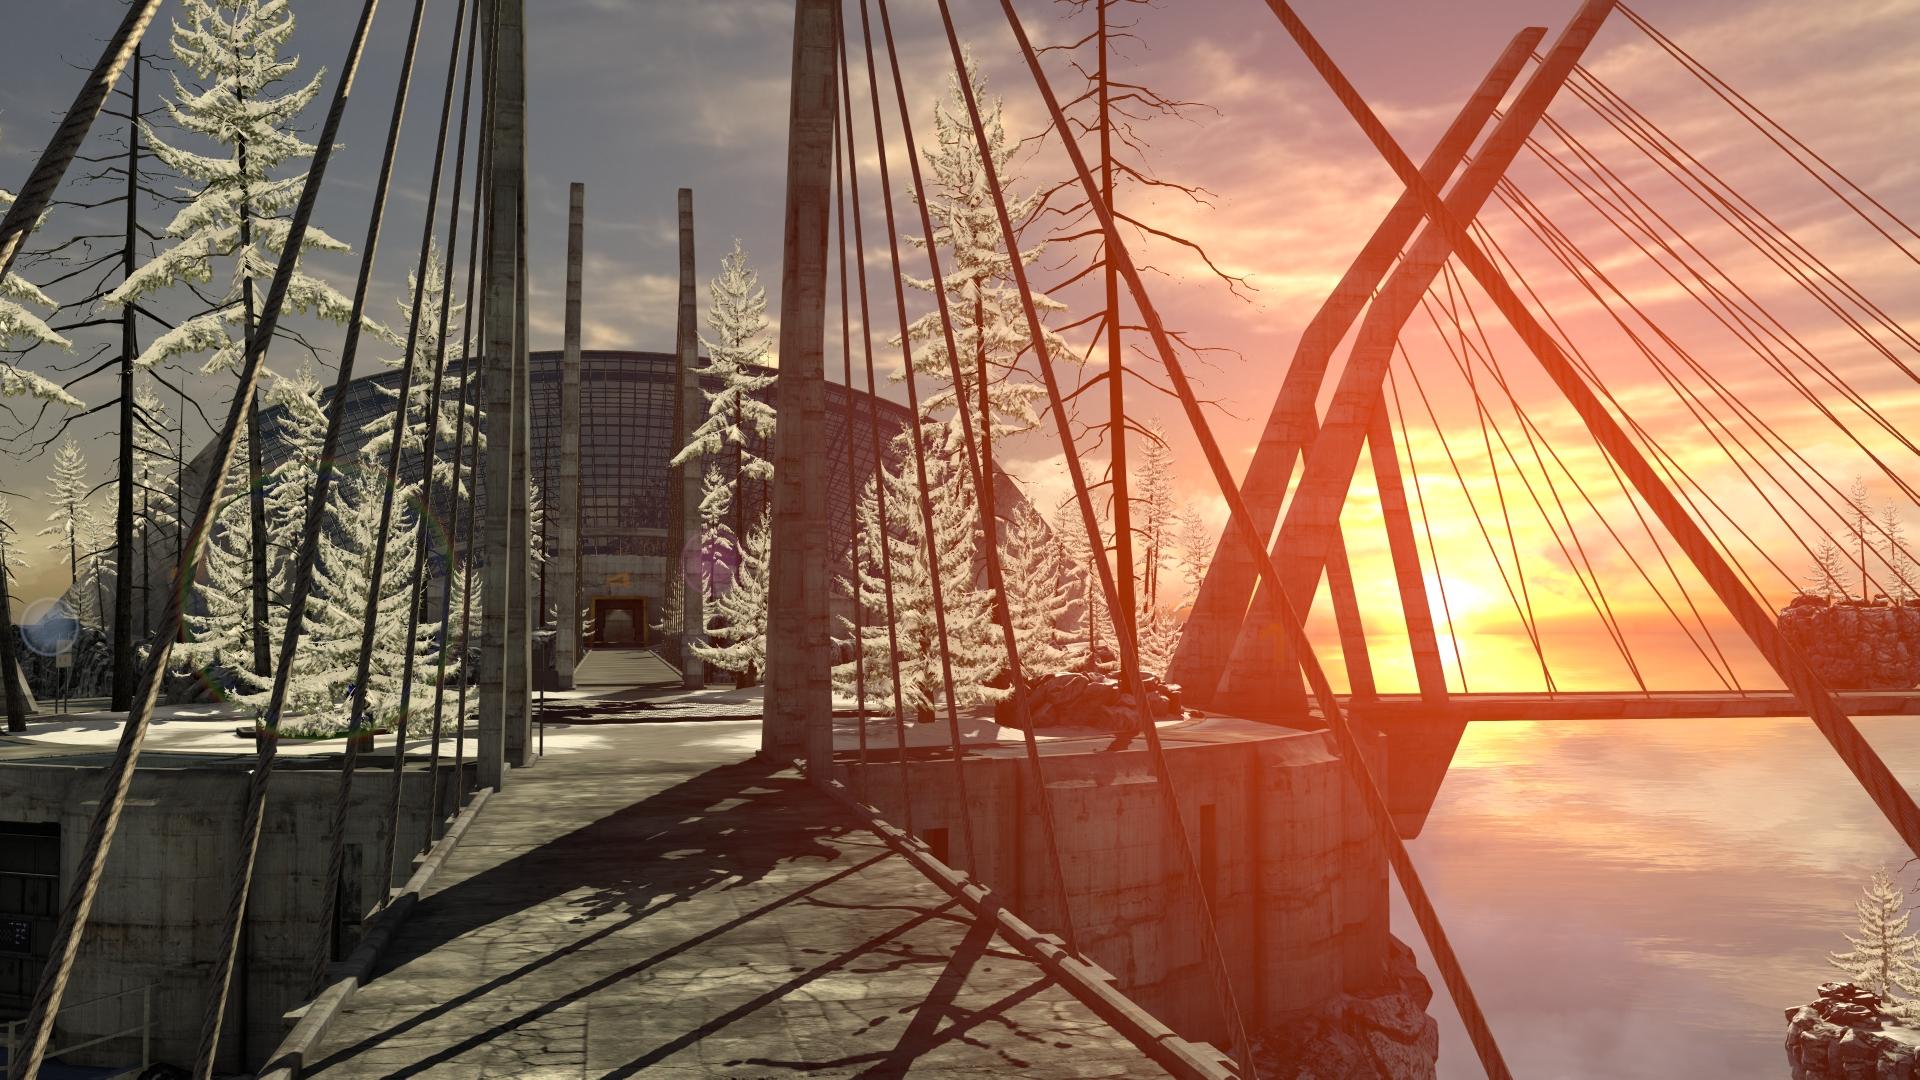 The Talos Principle: Road To Gehenna screenshot